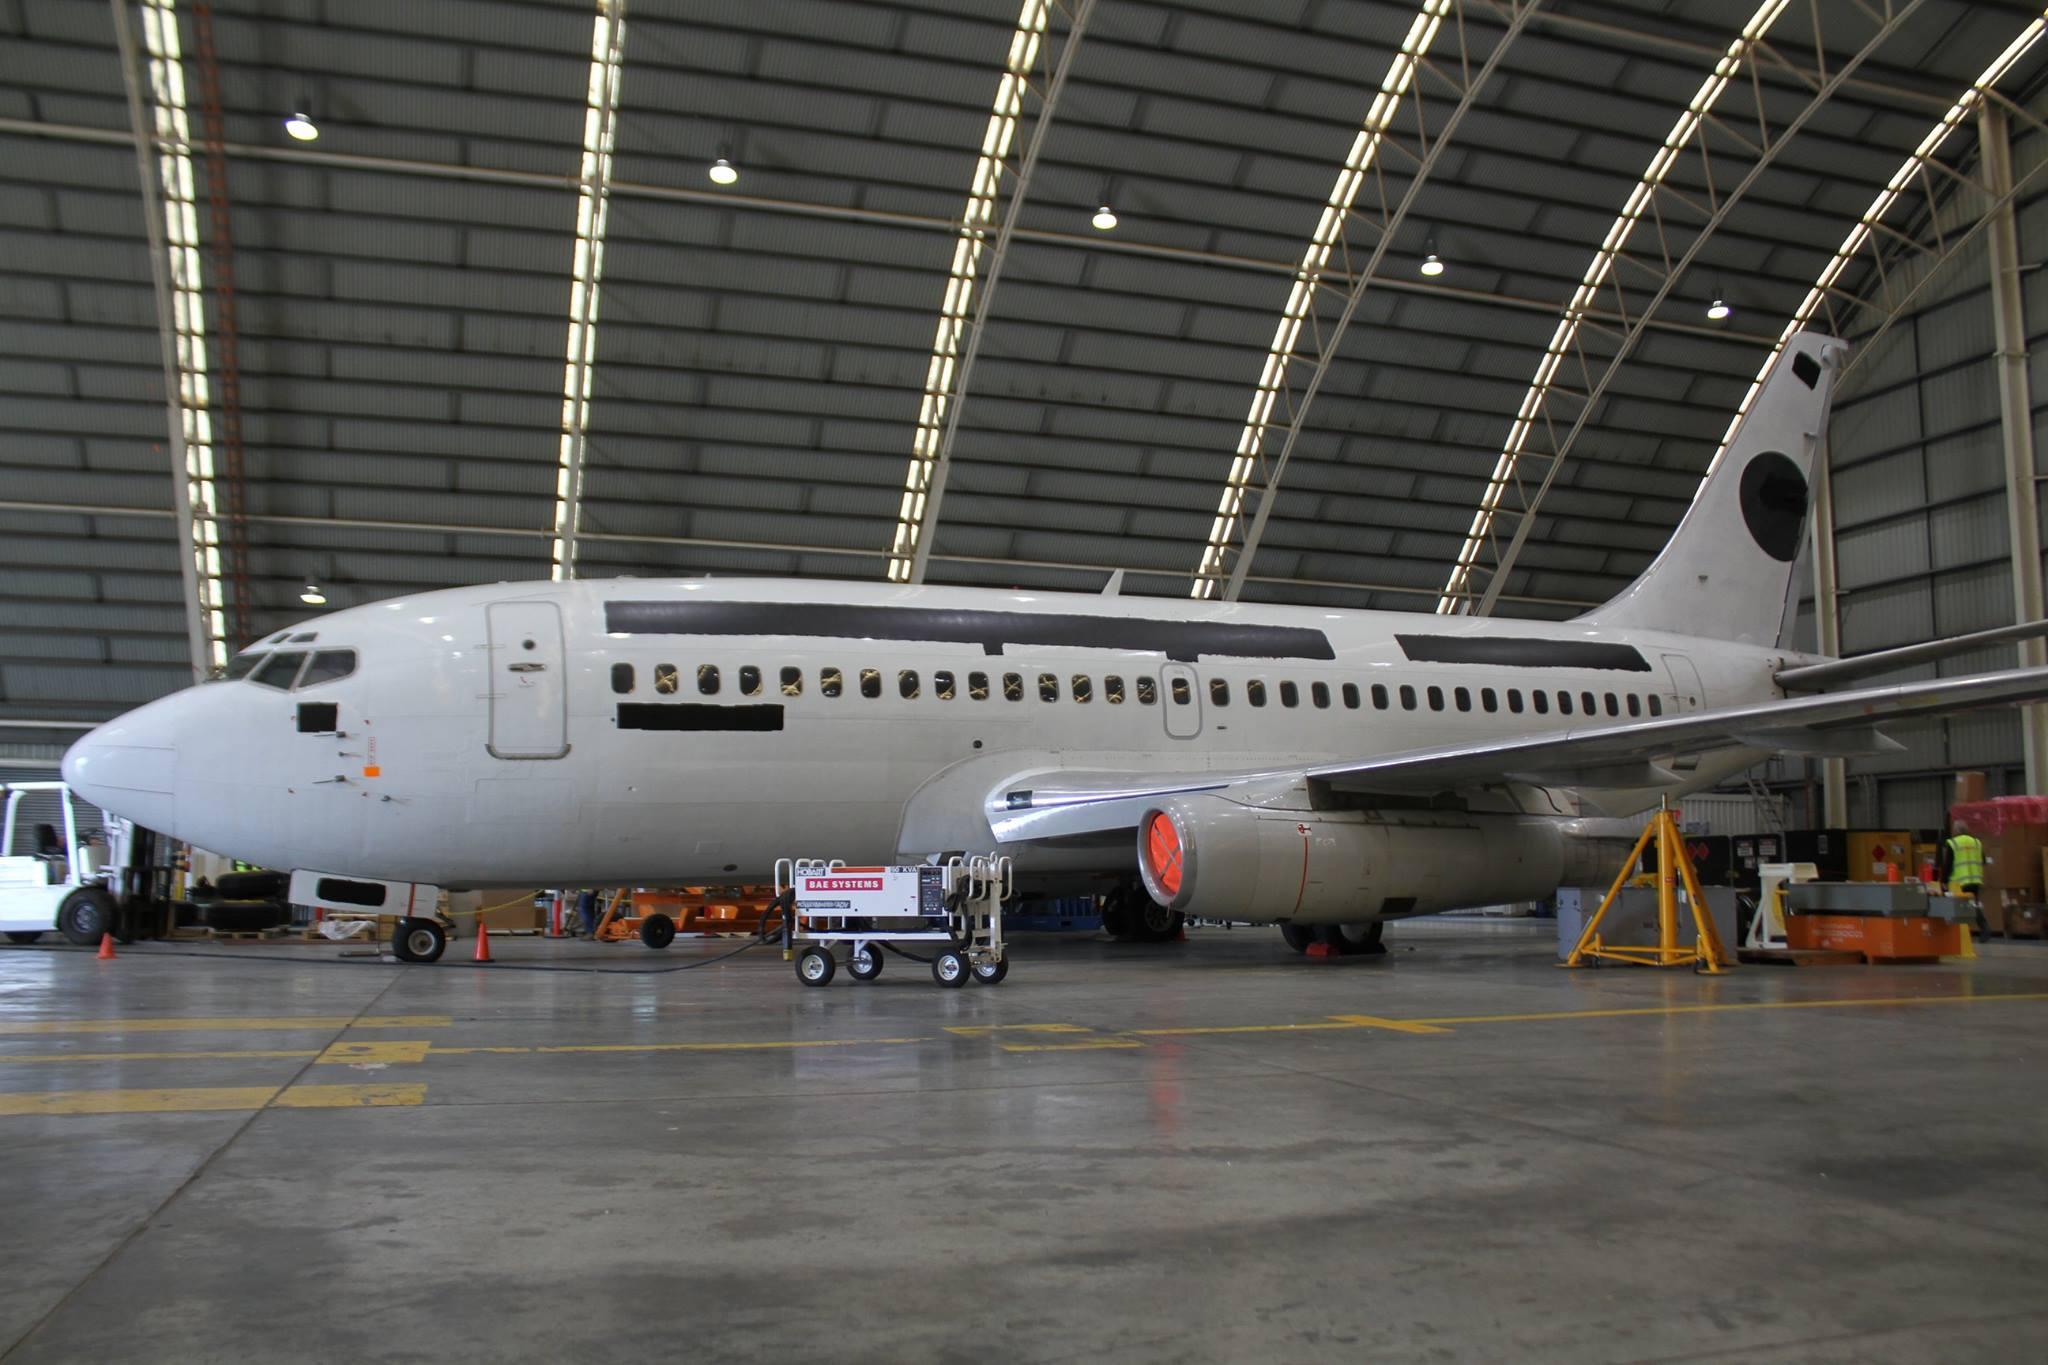 737 still complete